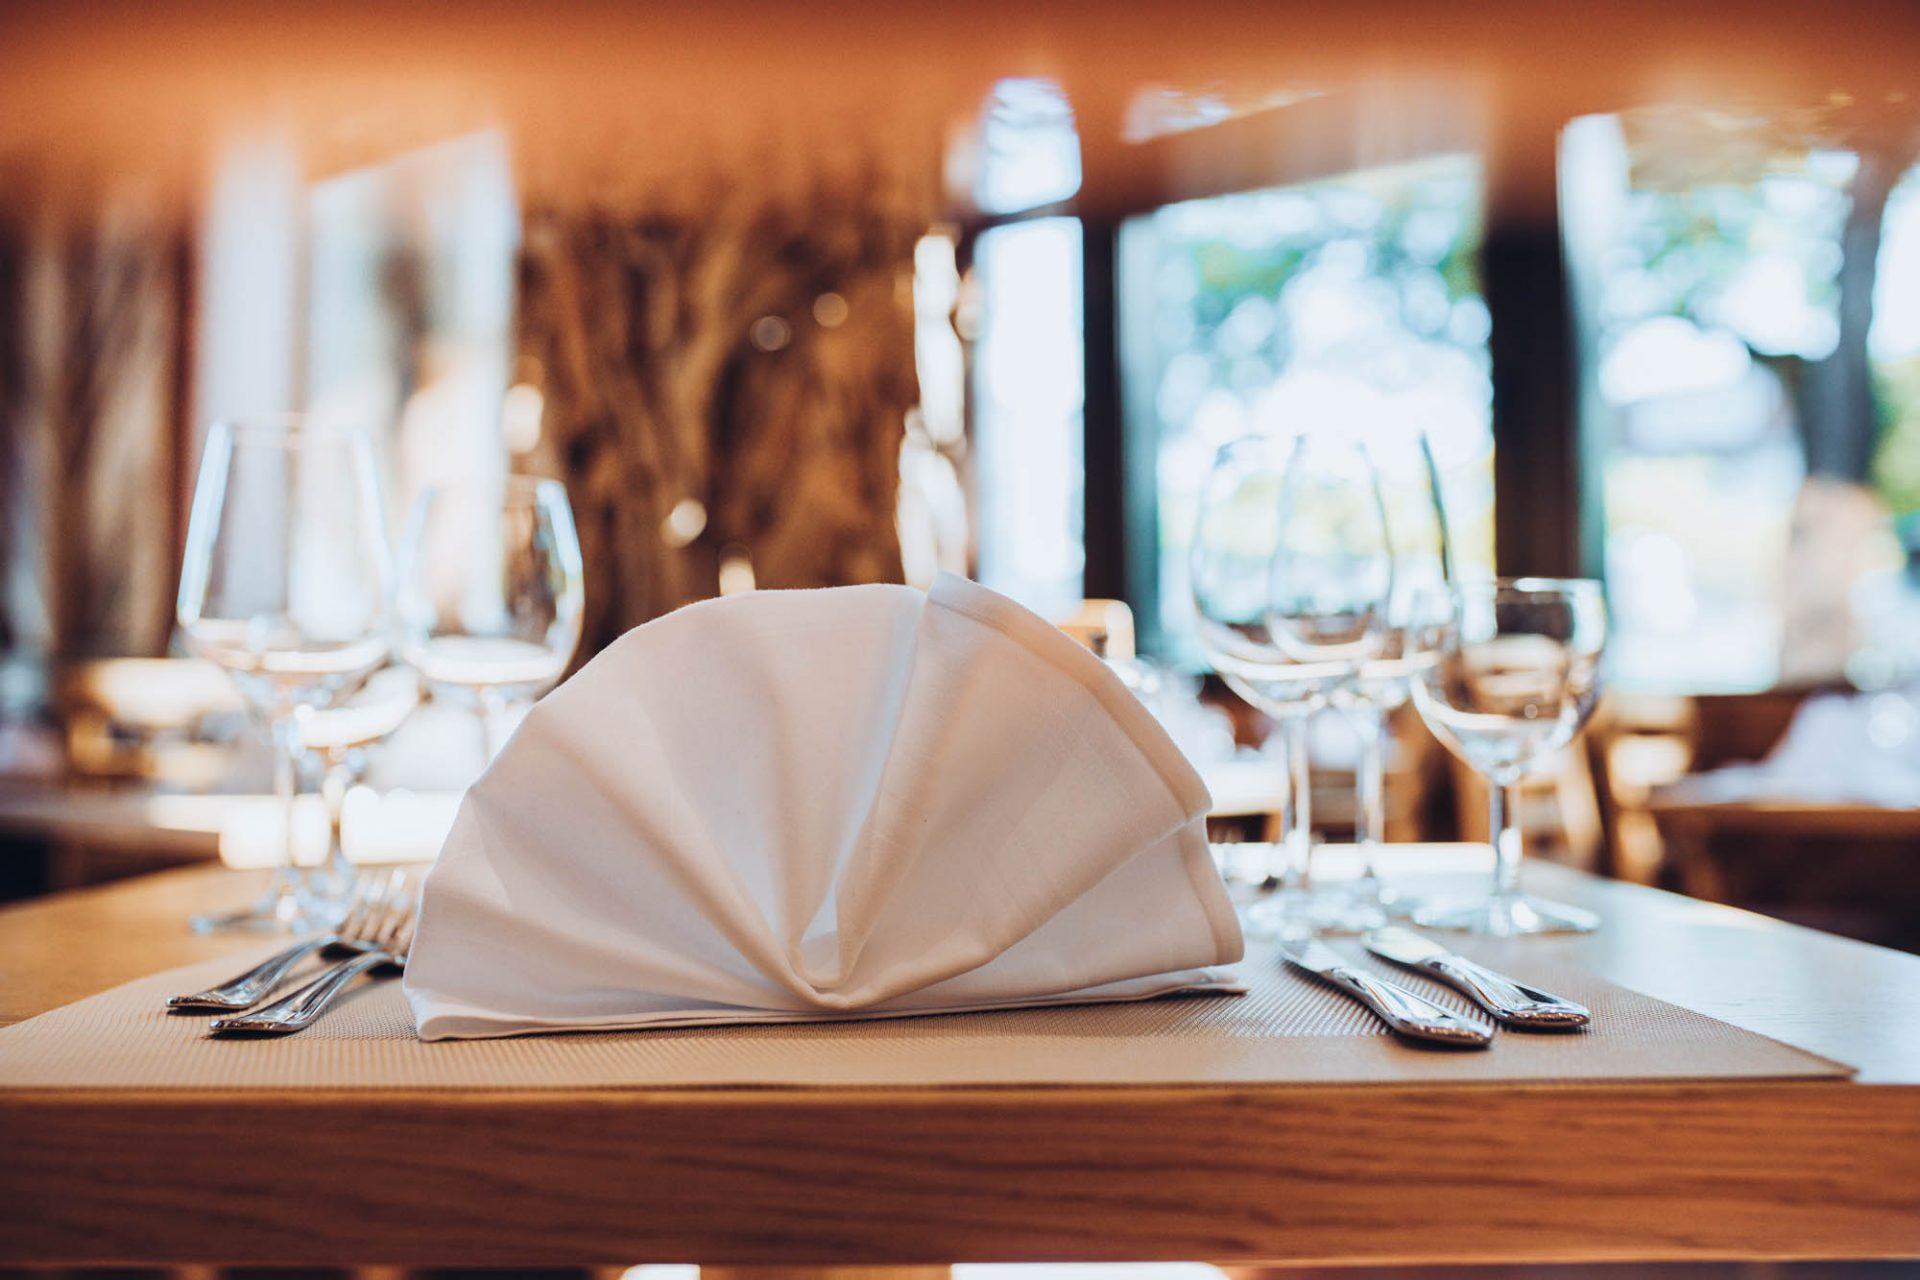 gavesi-eching-restaurant-062020-mokati-fotos-film-70